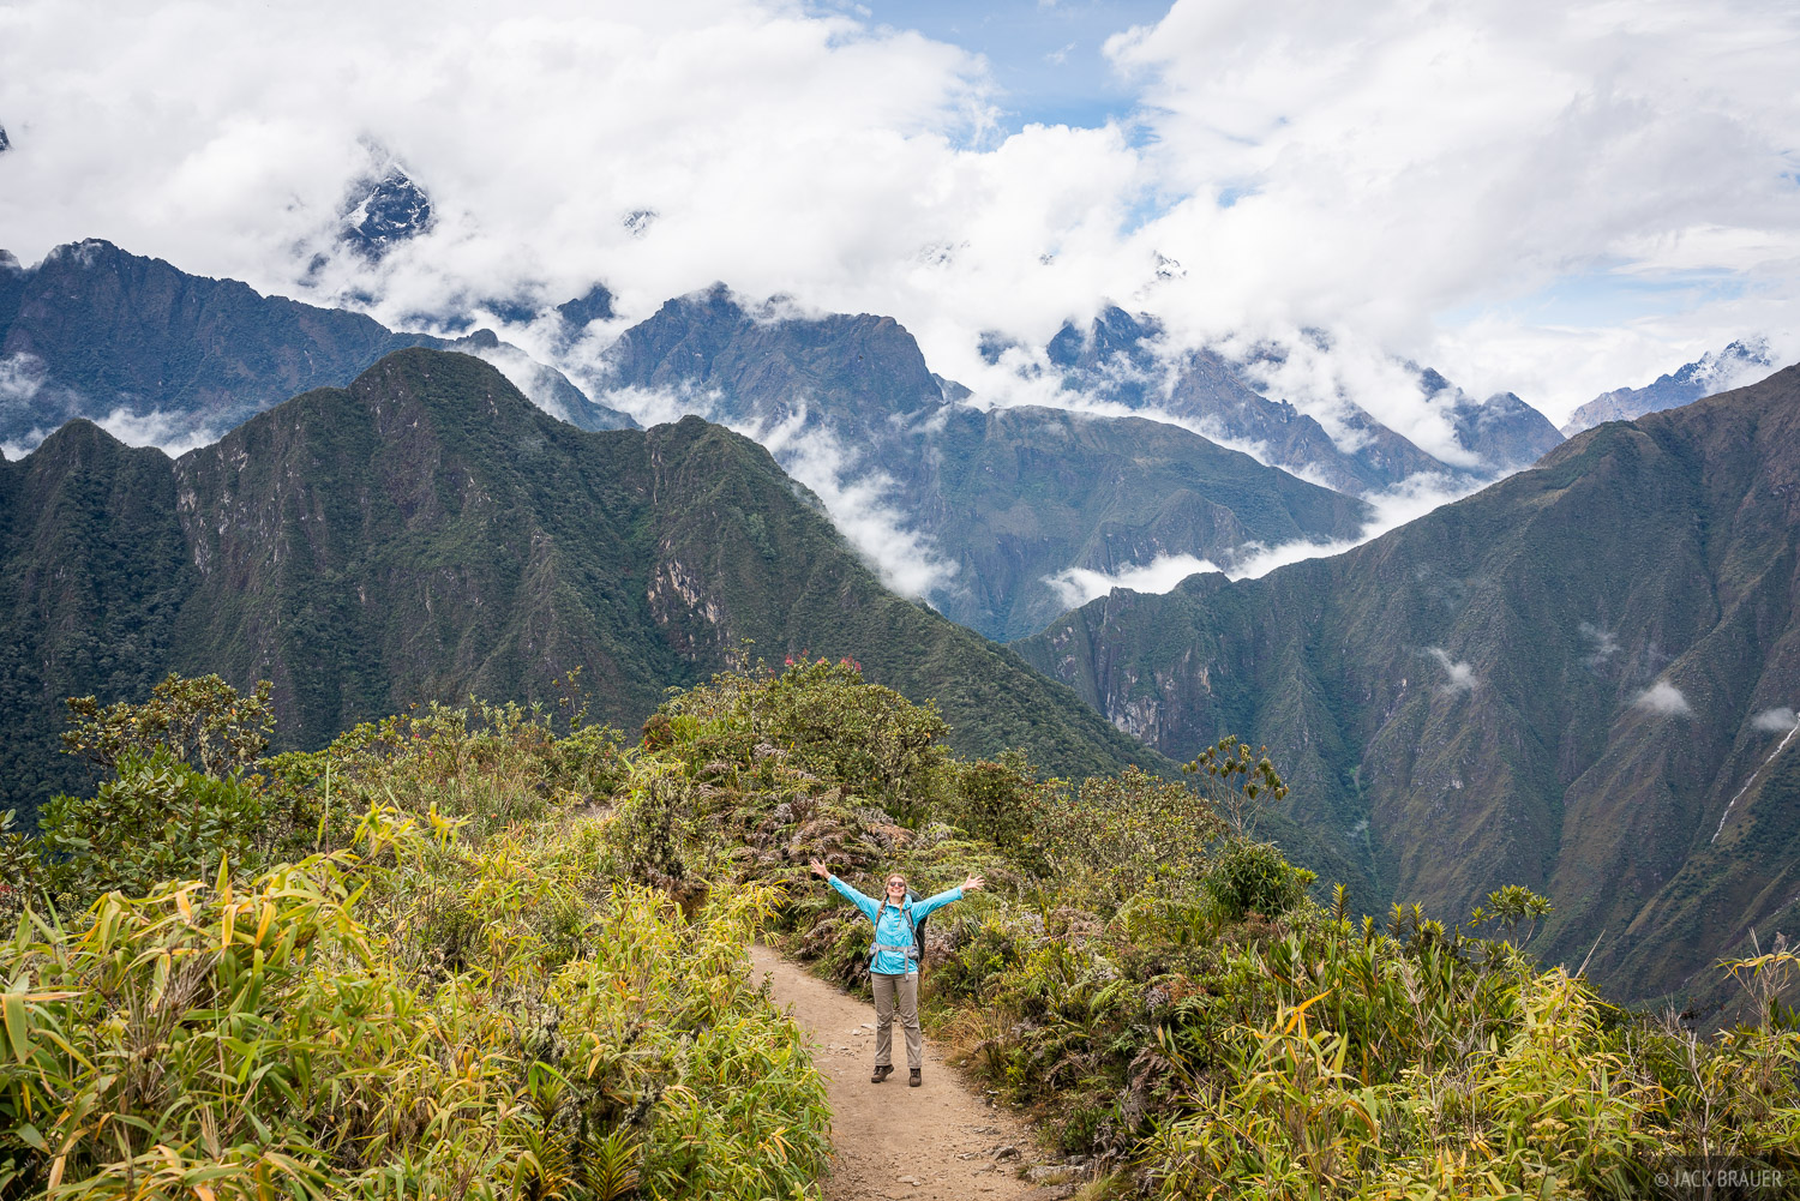 Cordillera Vilcabamba, Macchu Picchu, Peru, South America, hiking, photo